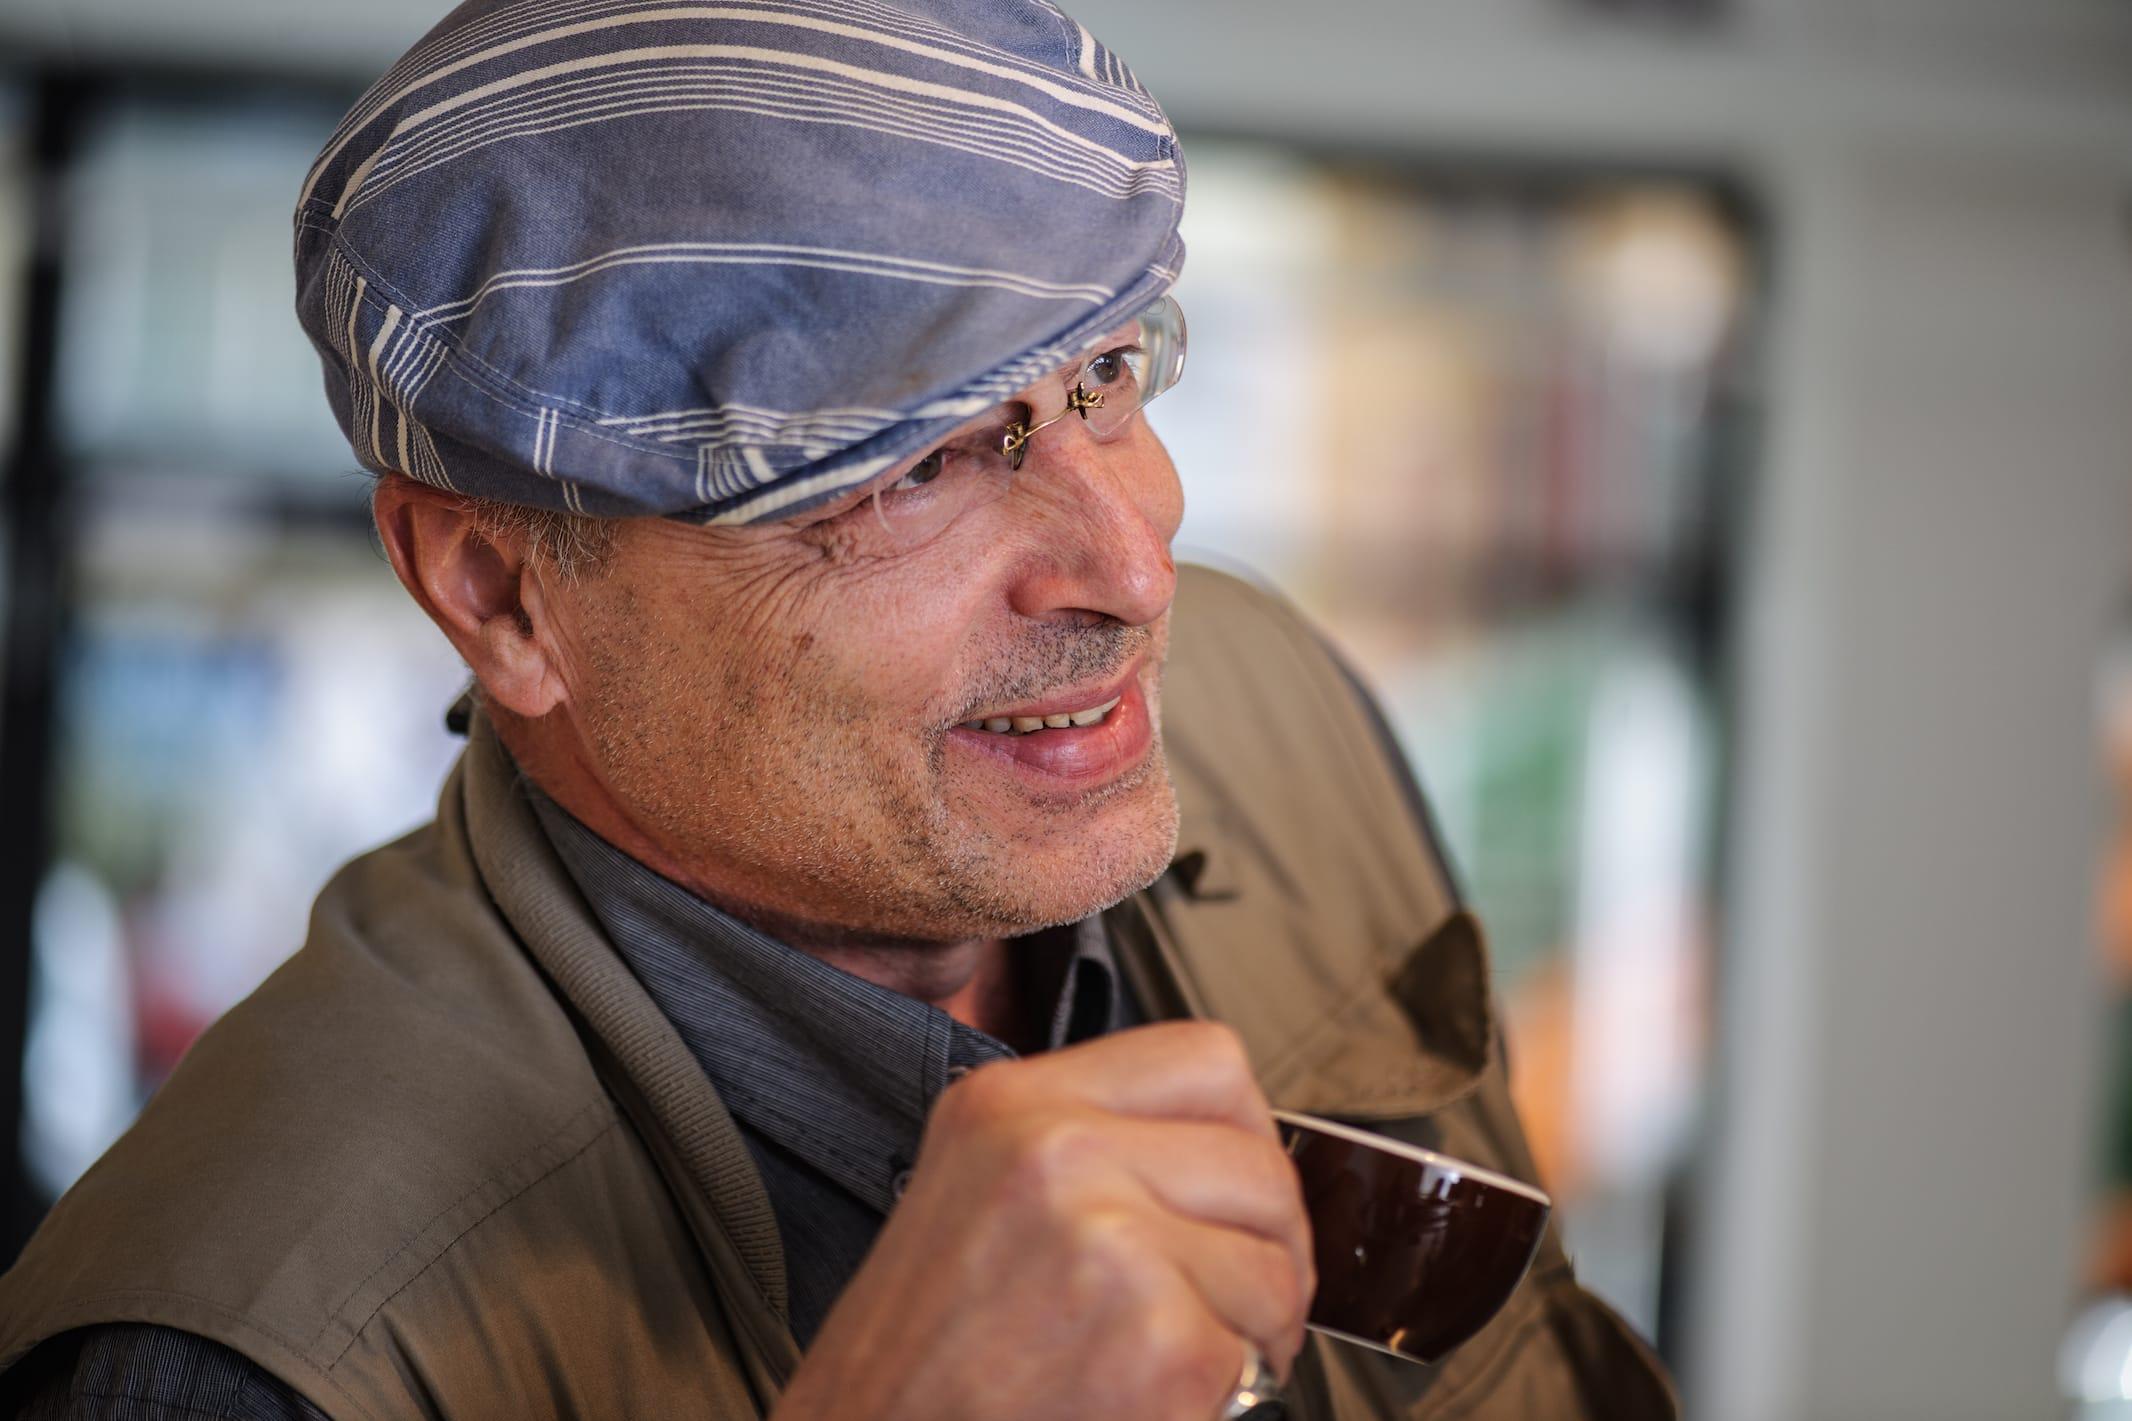 ludwig-oechslin-espresso-blogpost-oct-2014-vico20141015_0064_RGB-2132px